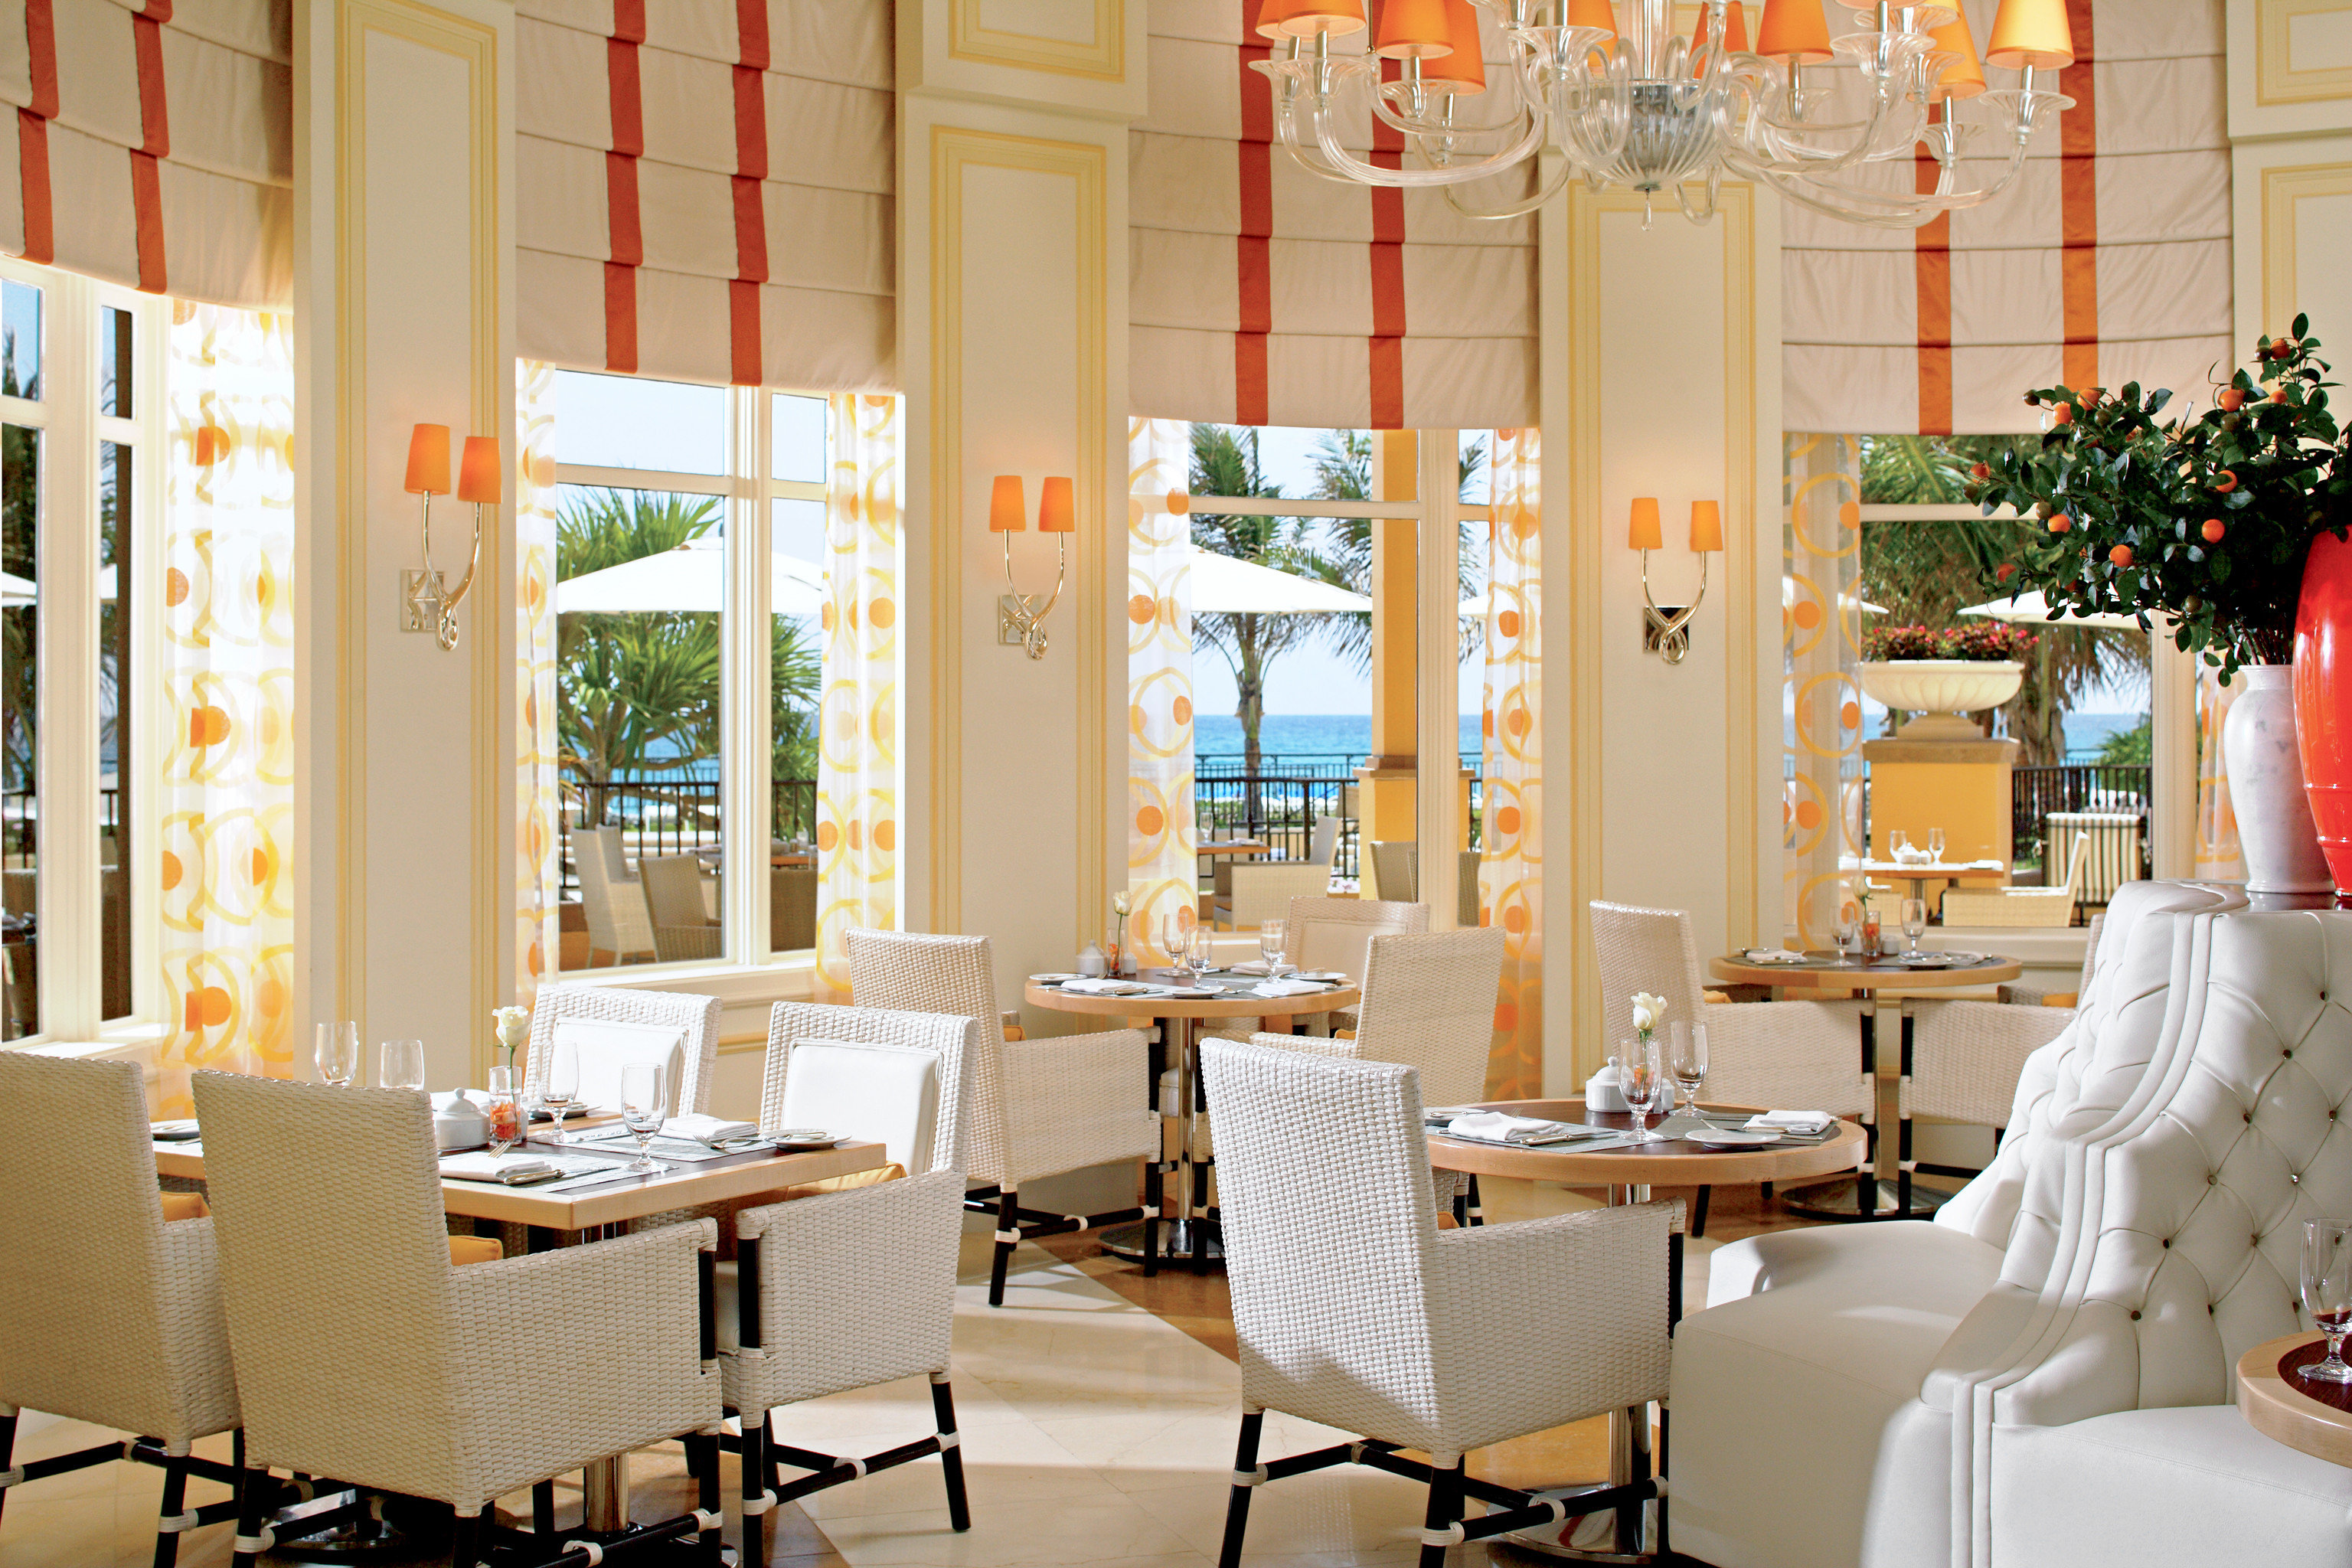 Dining Drink Eat Modern Resort Scenic views restaurant white home living room dining table